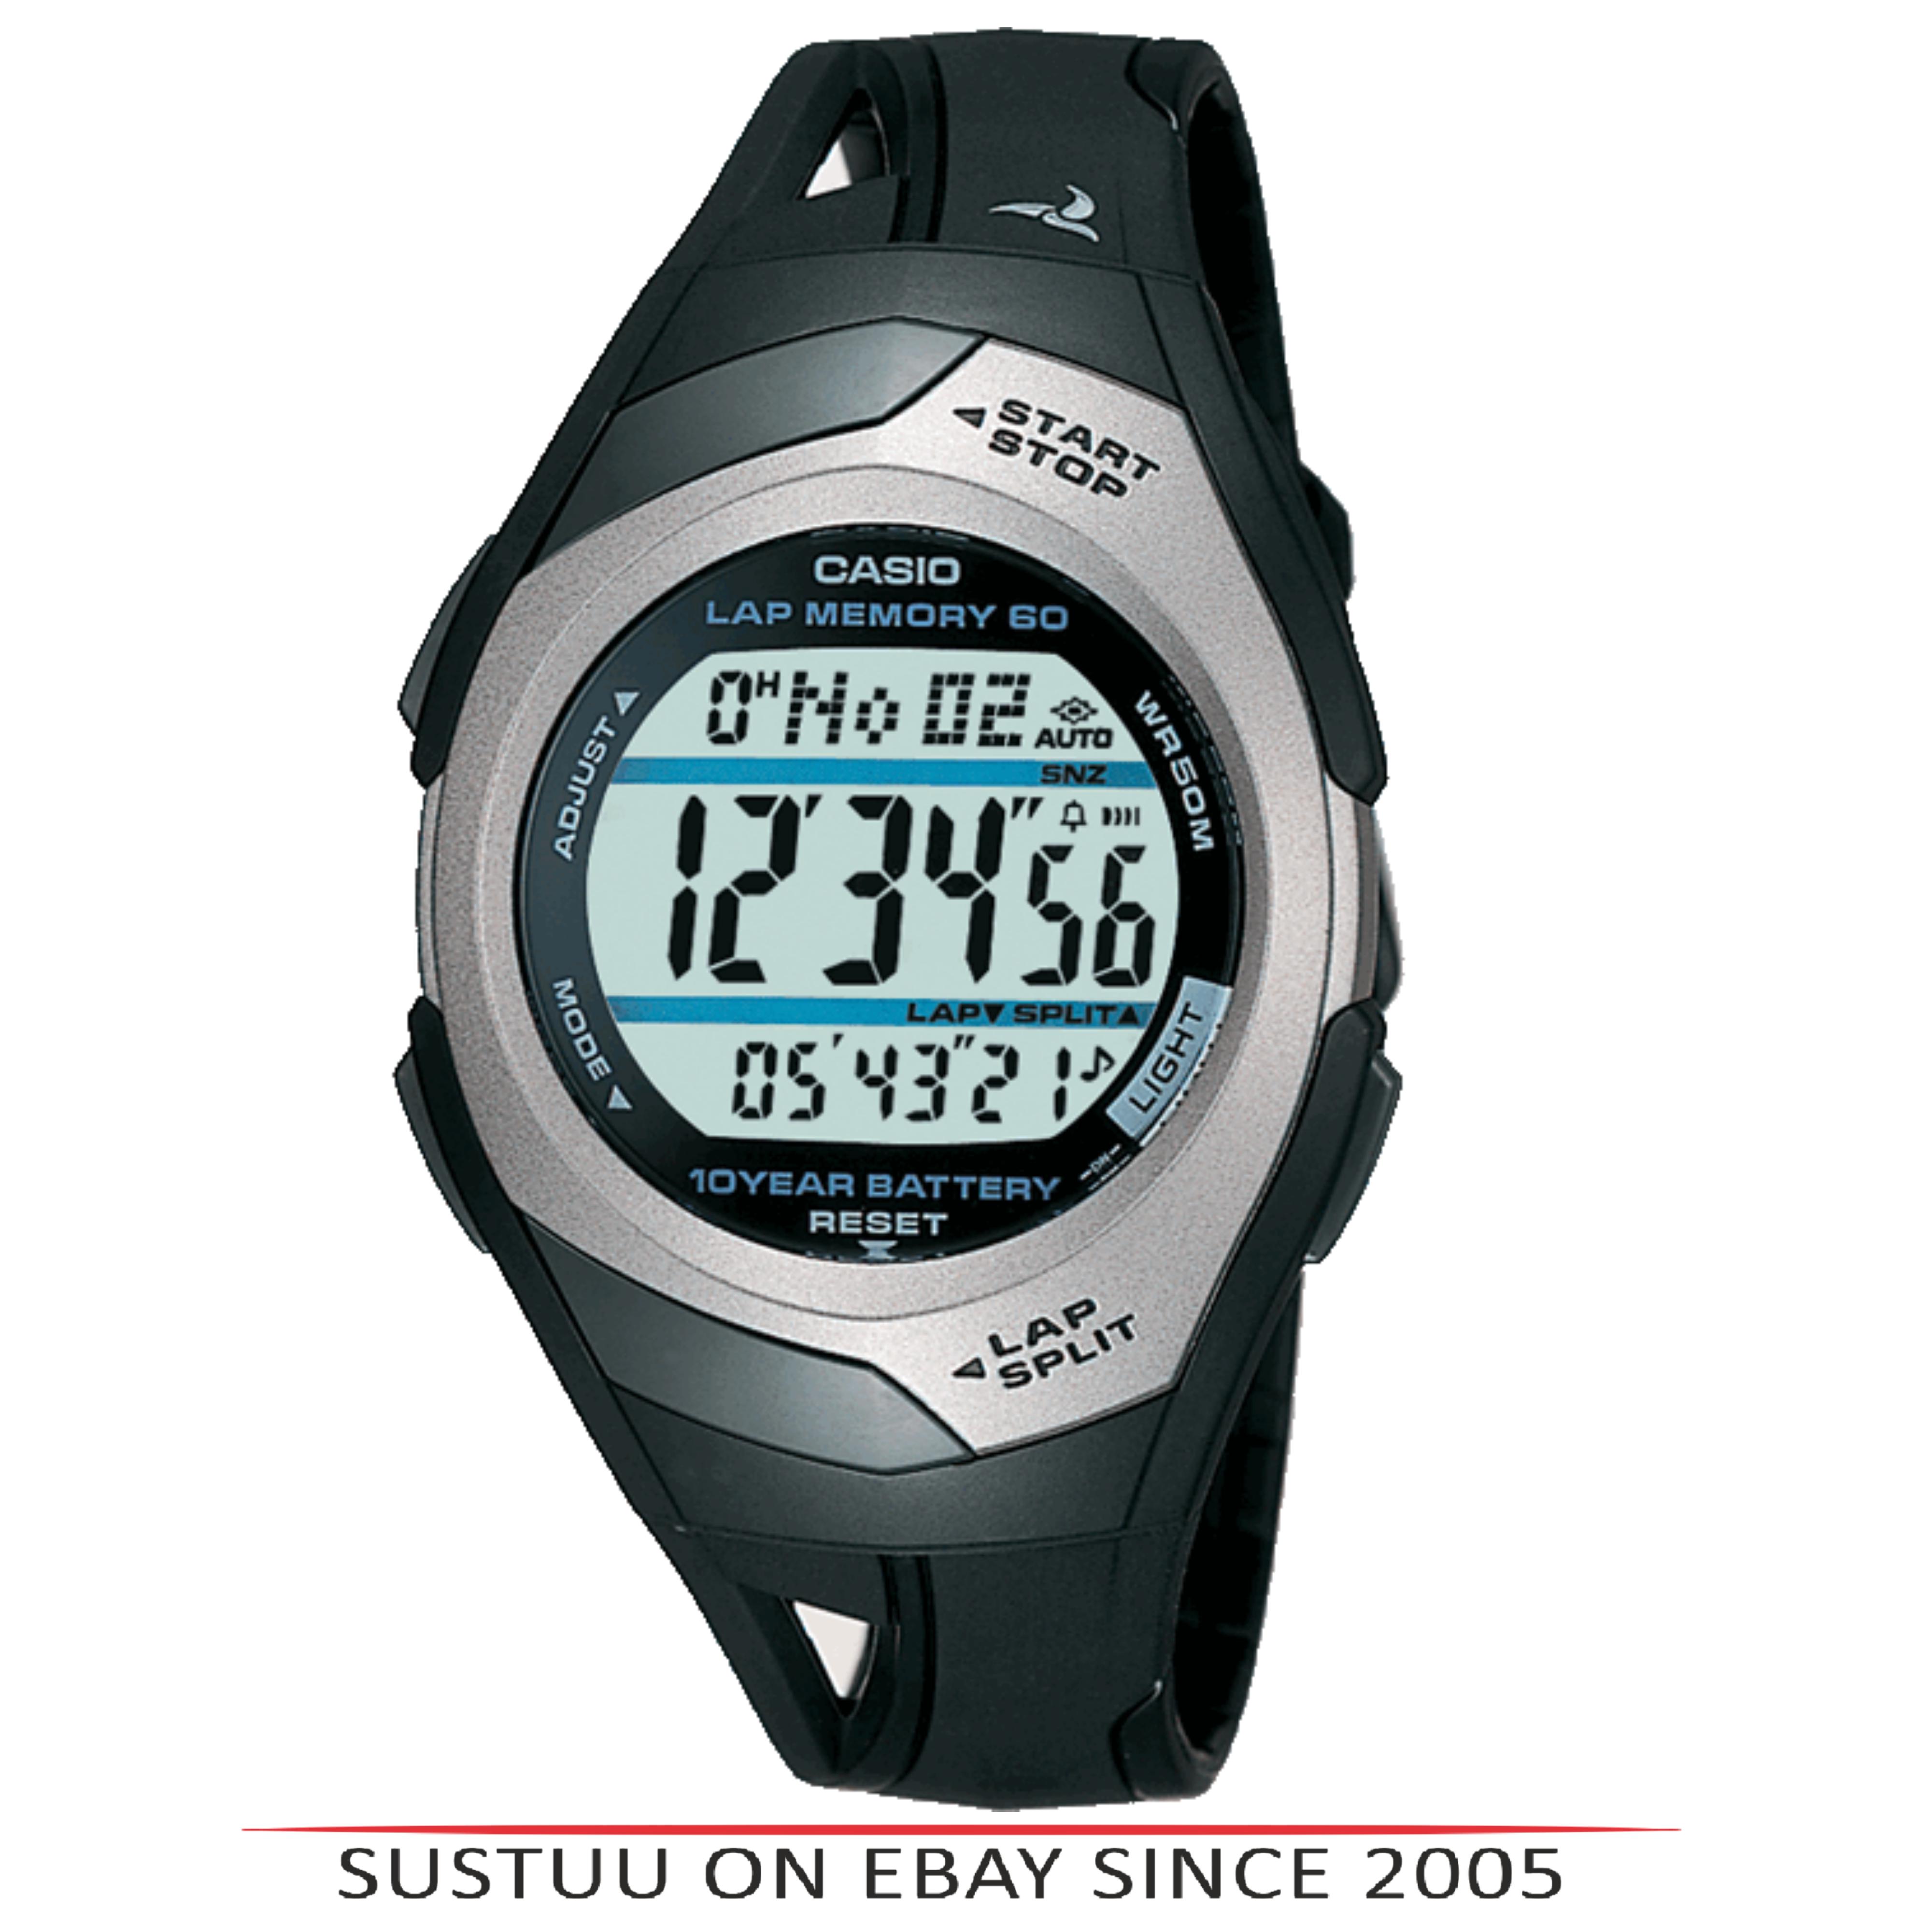 716c5804933e Sentinel Casio STR300C-1VER o Mens Watch│60 Lap Memory Timer│Resin Band│